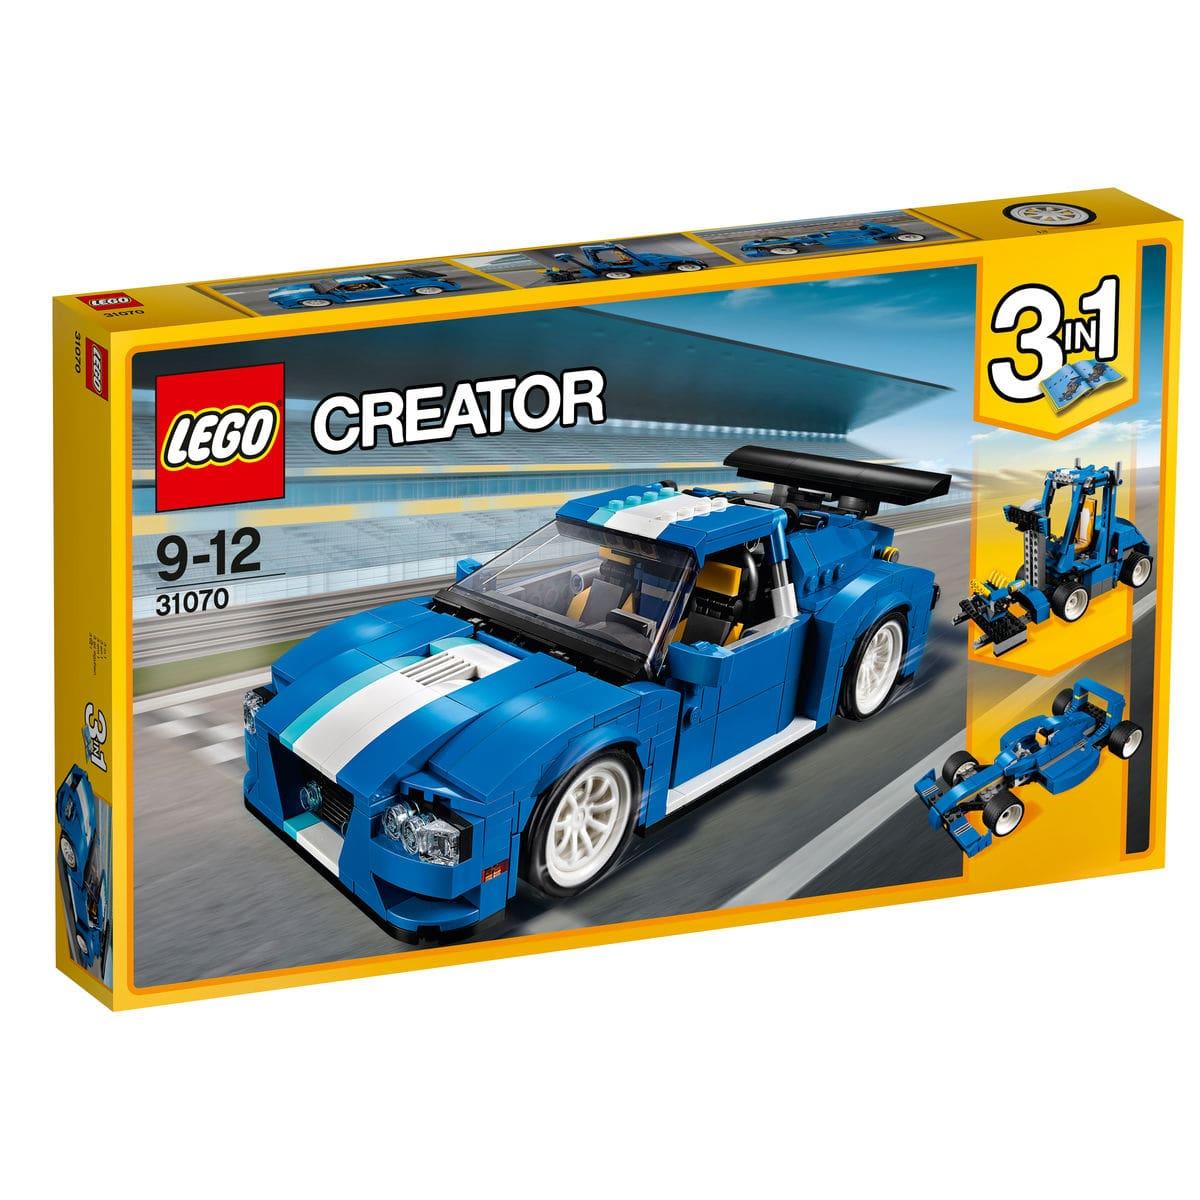 LEGO Creator Turborennwagen 31070